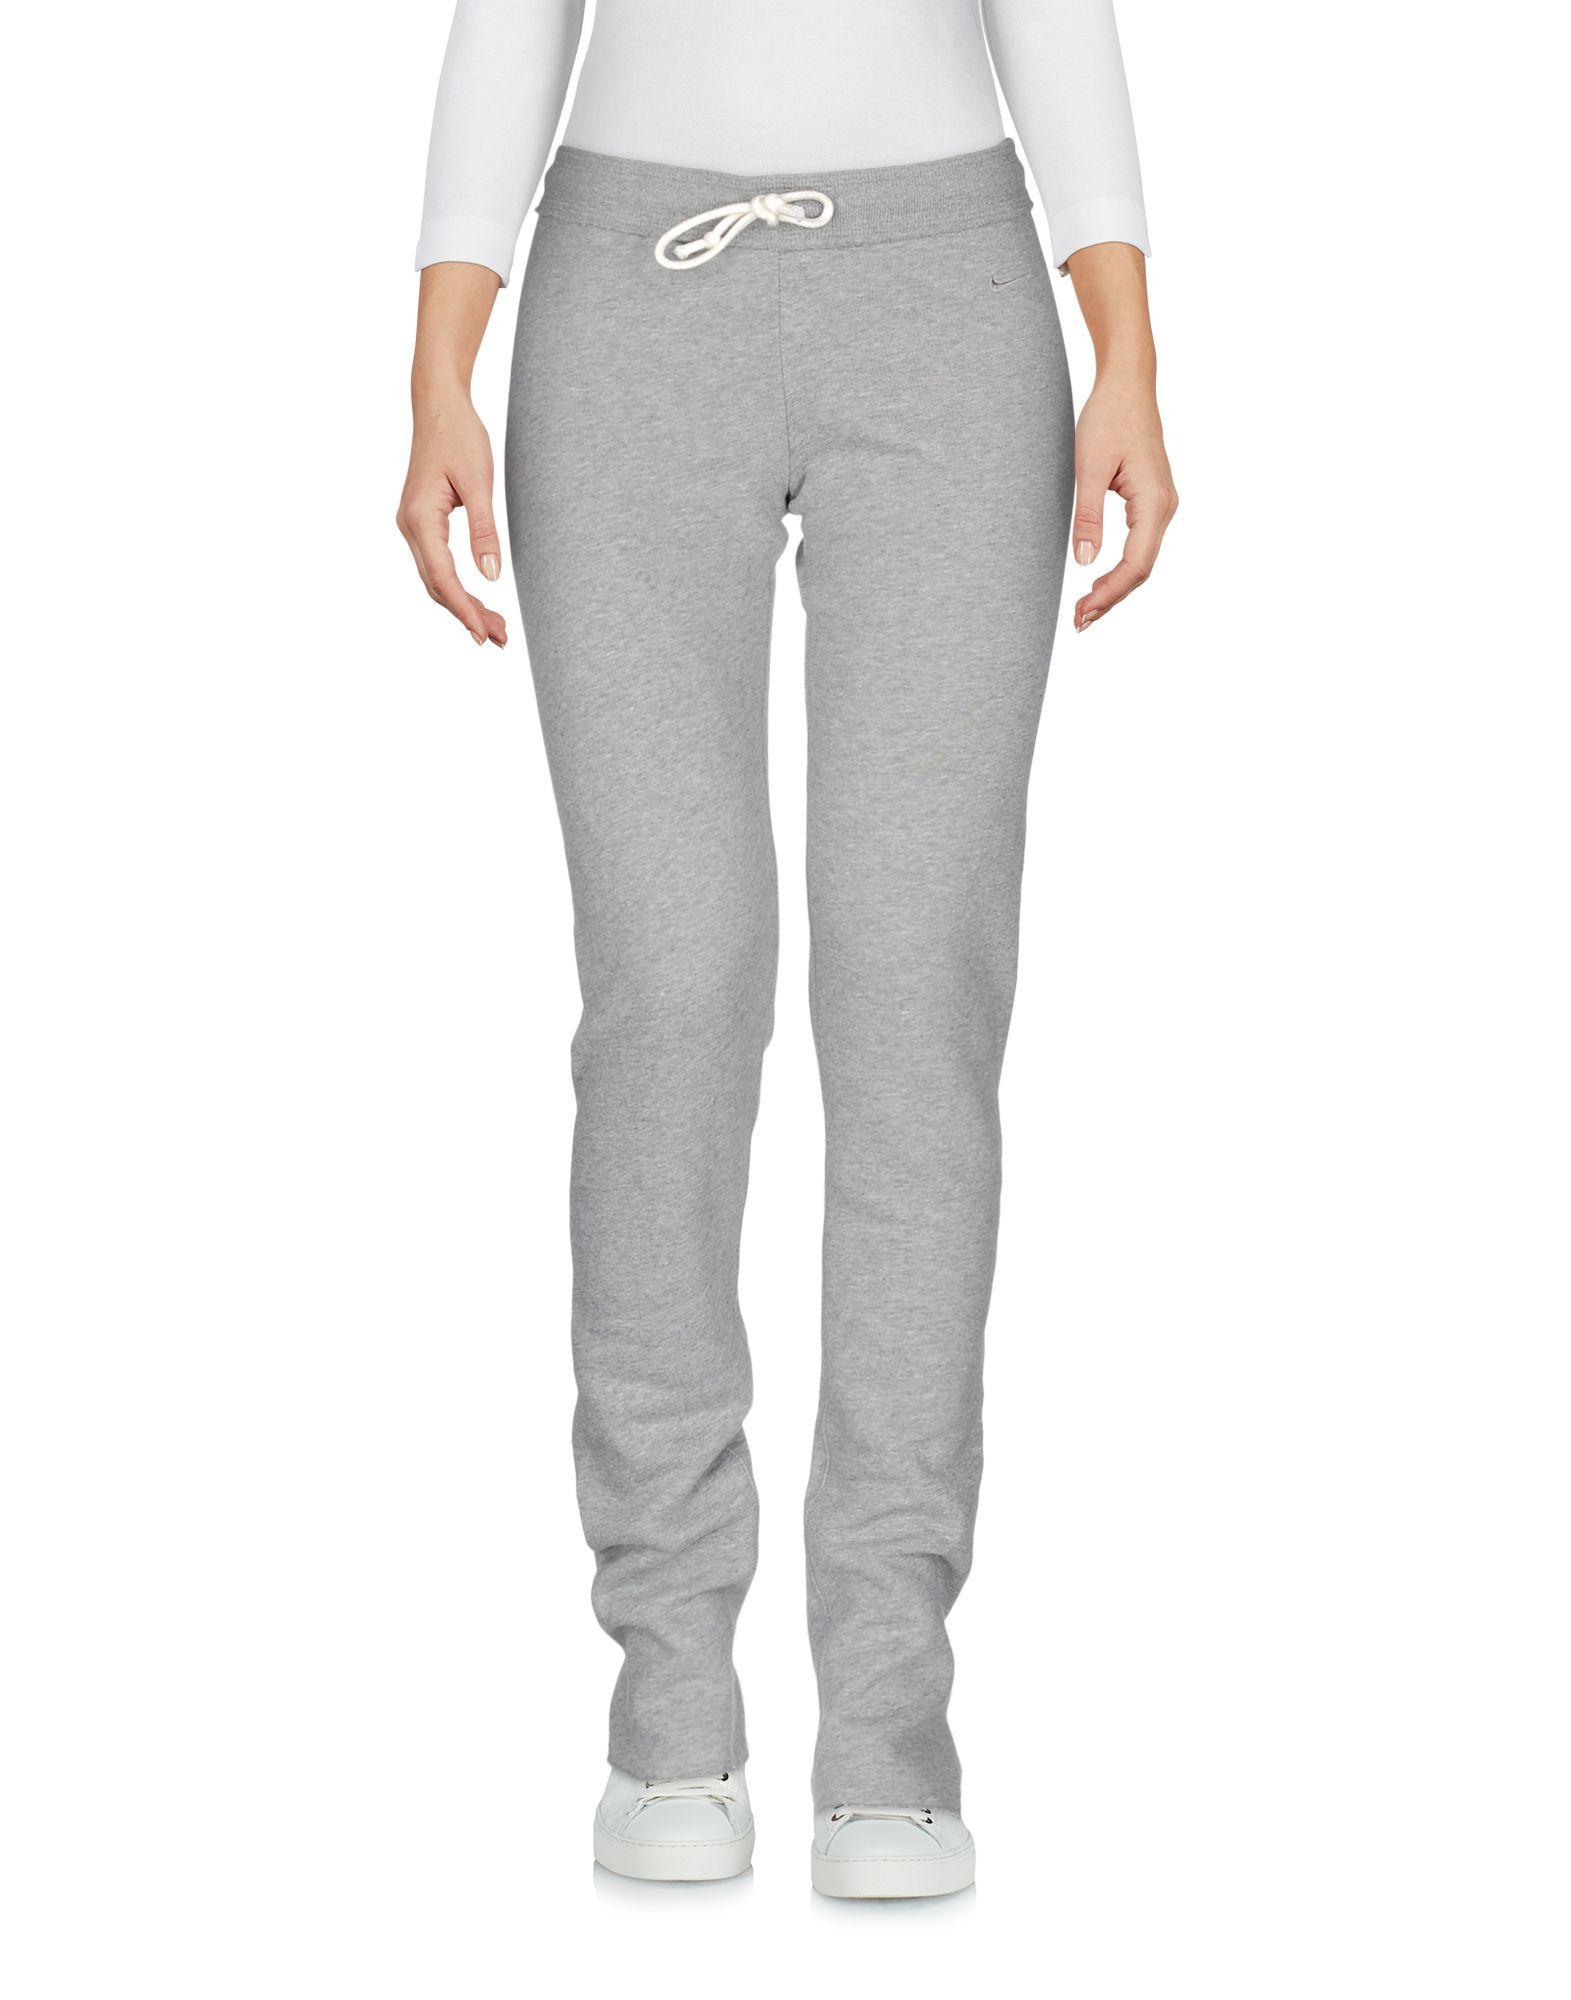 Nike Woman Light grey Casual trousers